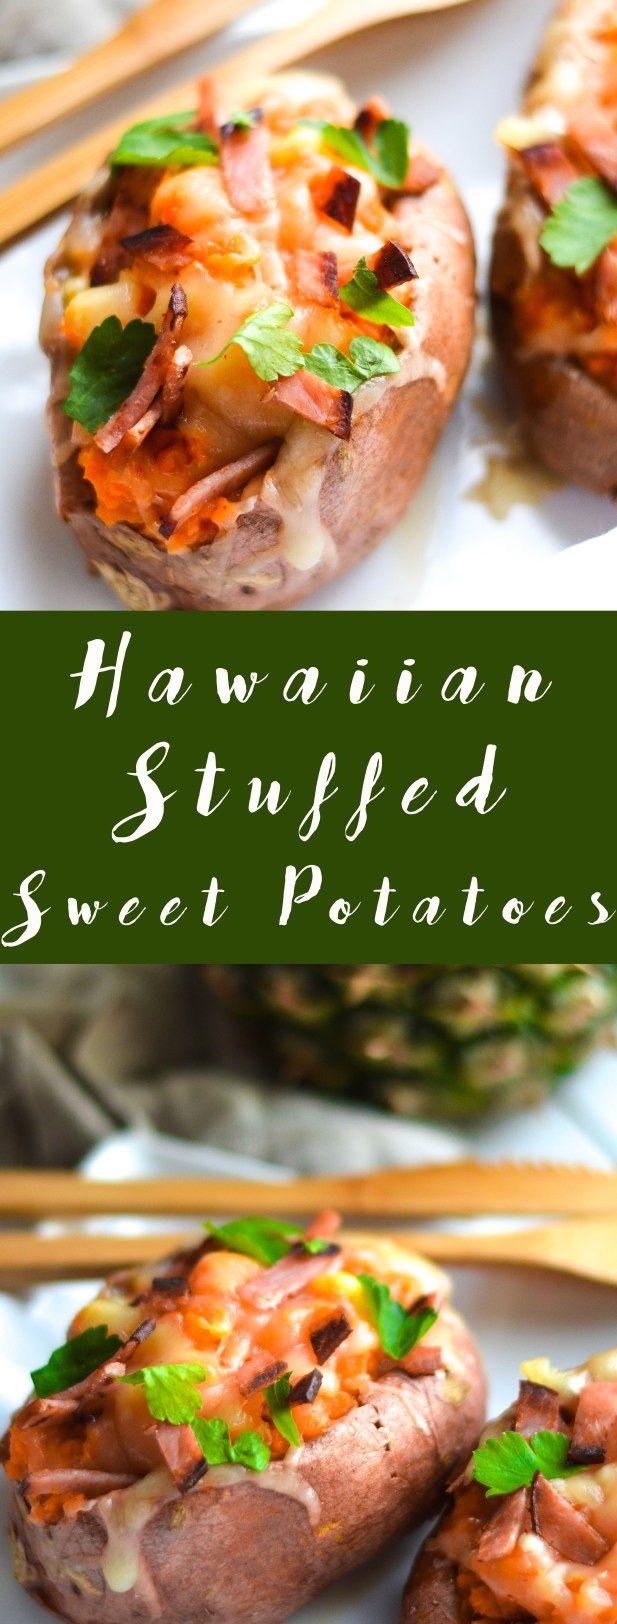 These sweet and savory Hawaiian Stuffed Sweet Potatoes are a fun side dish the whole family will love! via @my